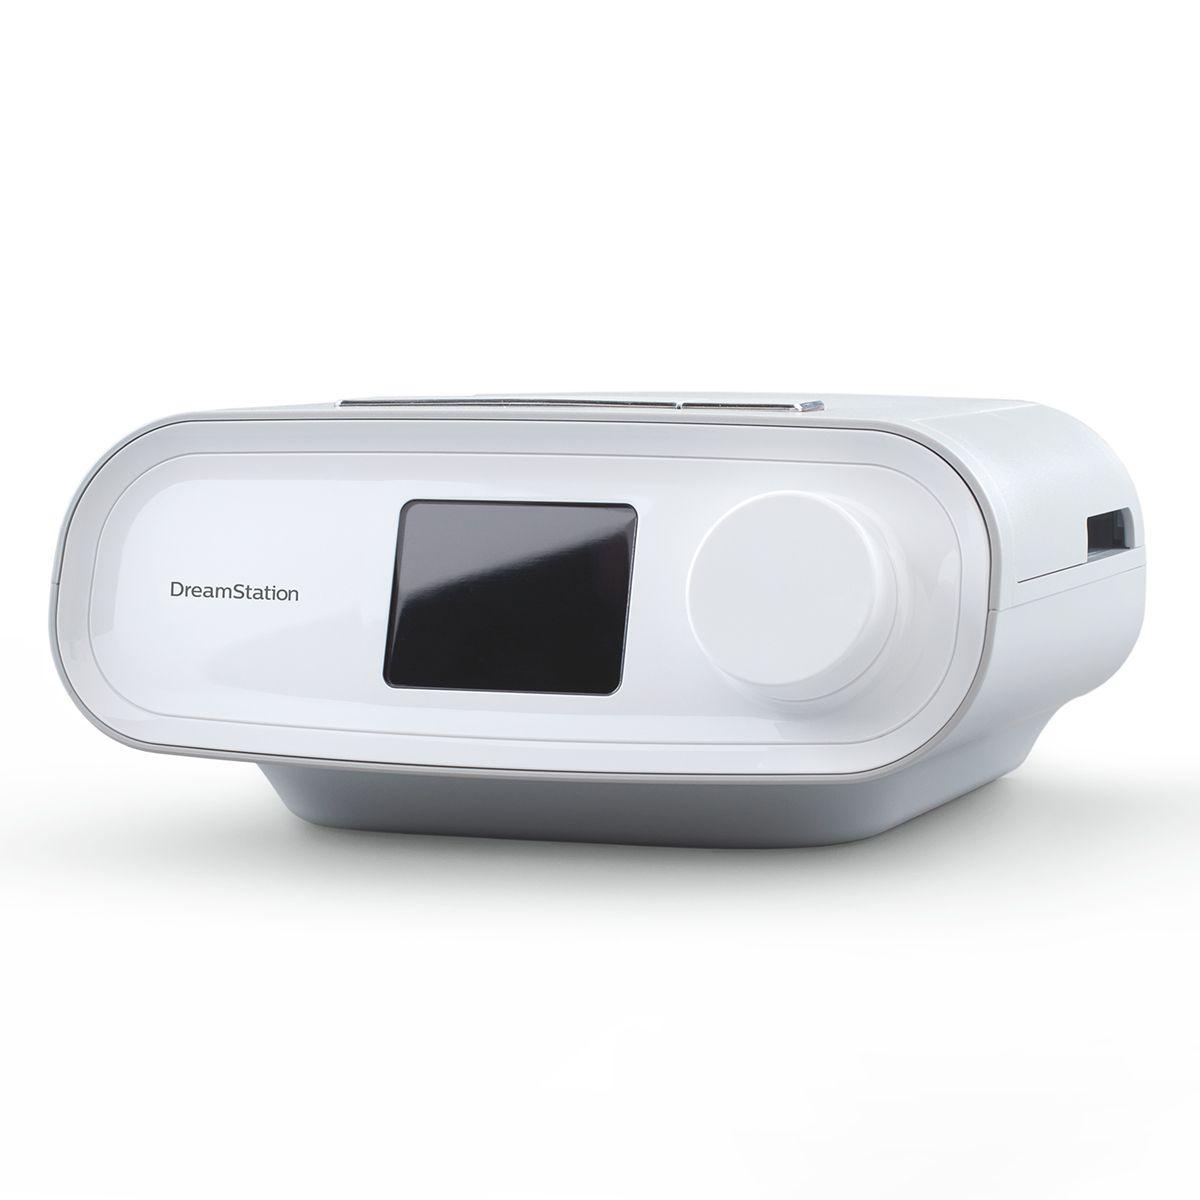 Kit CPAP Automático DreamStation Philips Respironics + Máscara Nasal Meridian